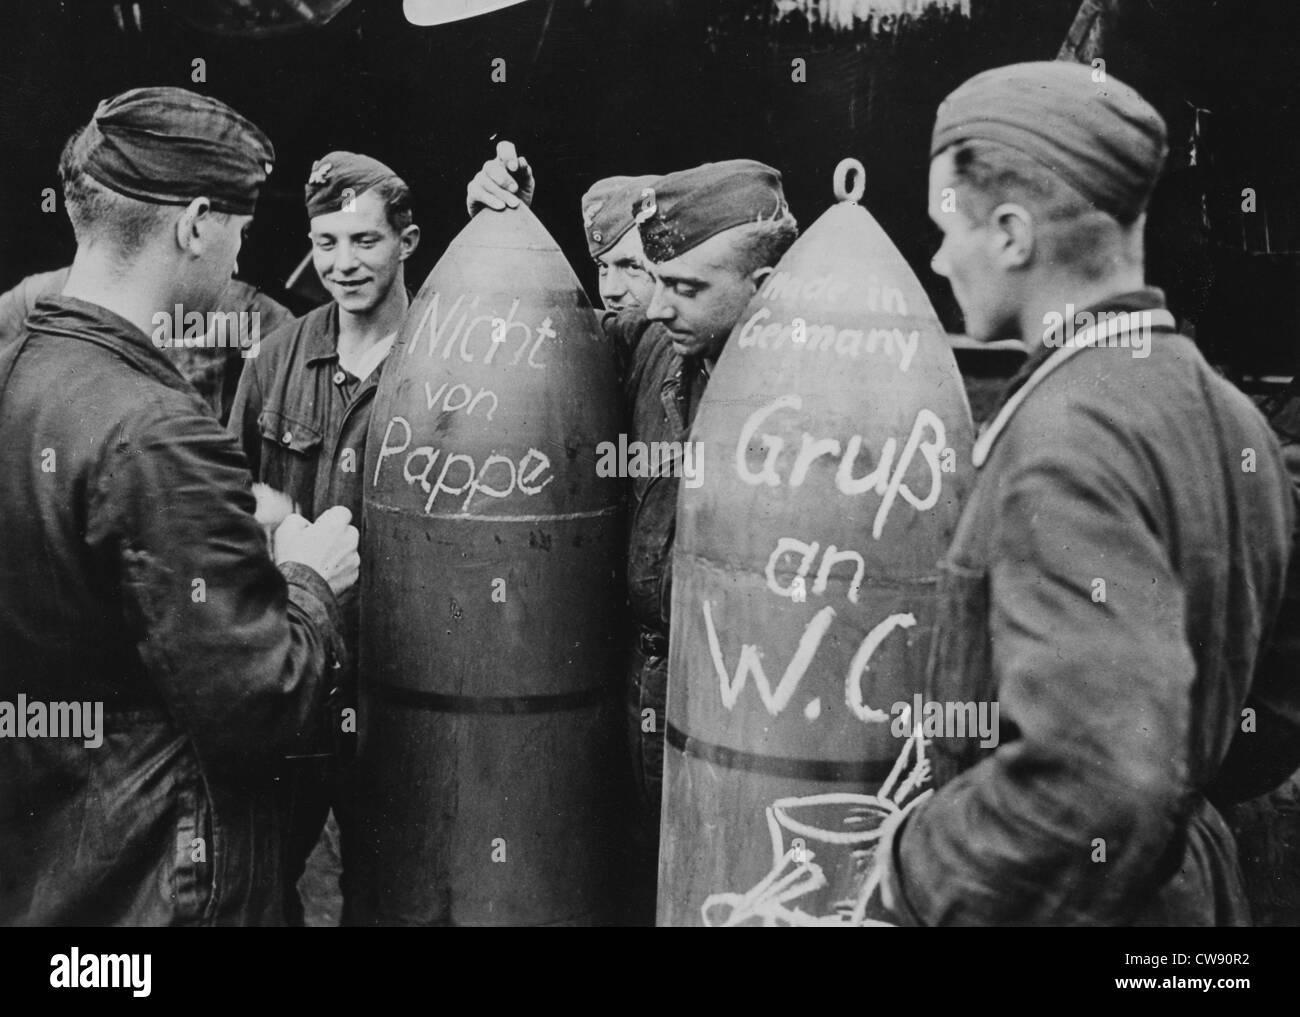 British pilotes' humour (1940) - Stock Image